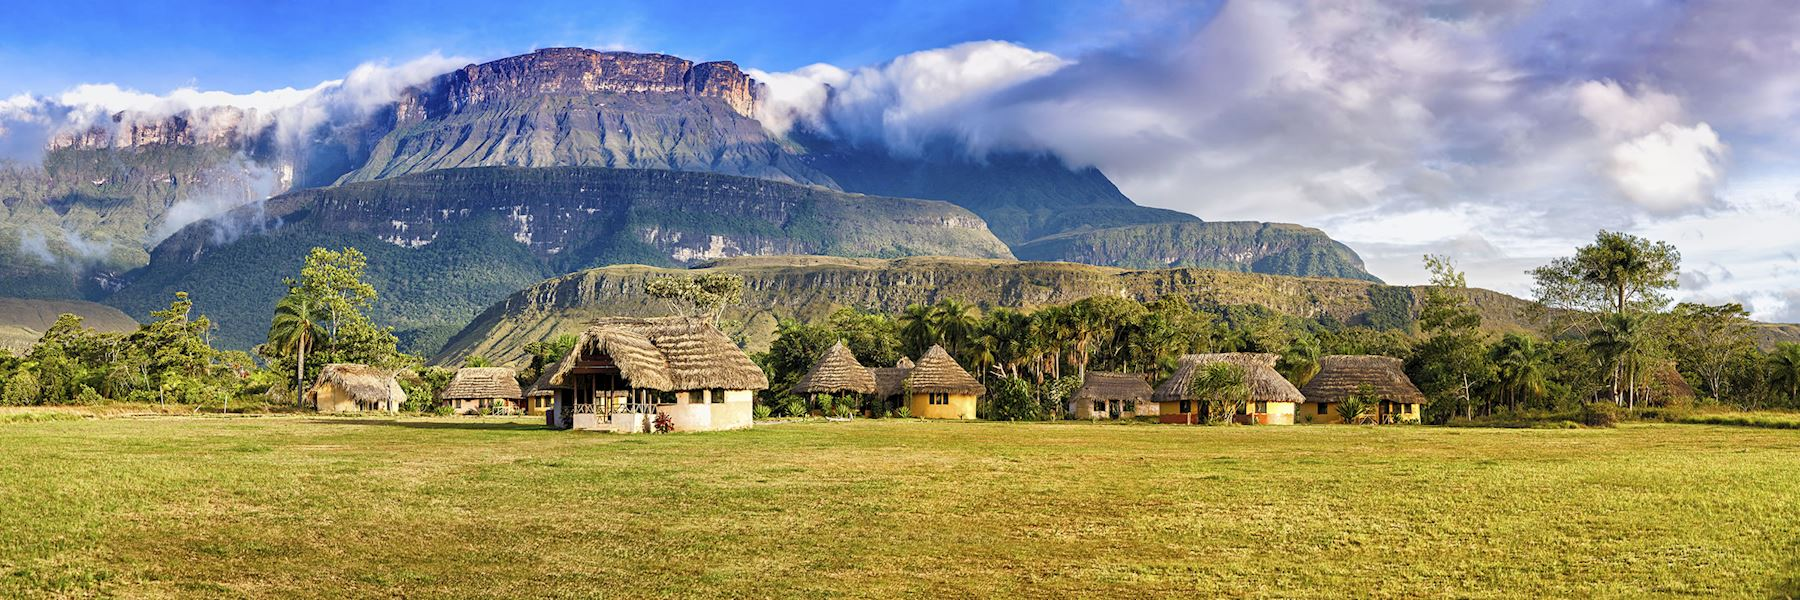 Places to visit in Venezuela